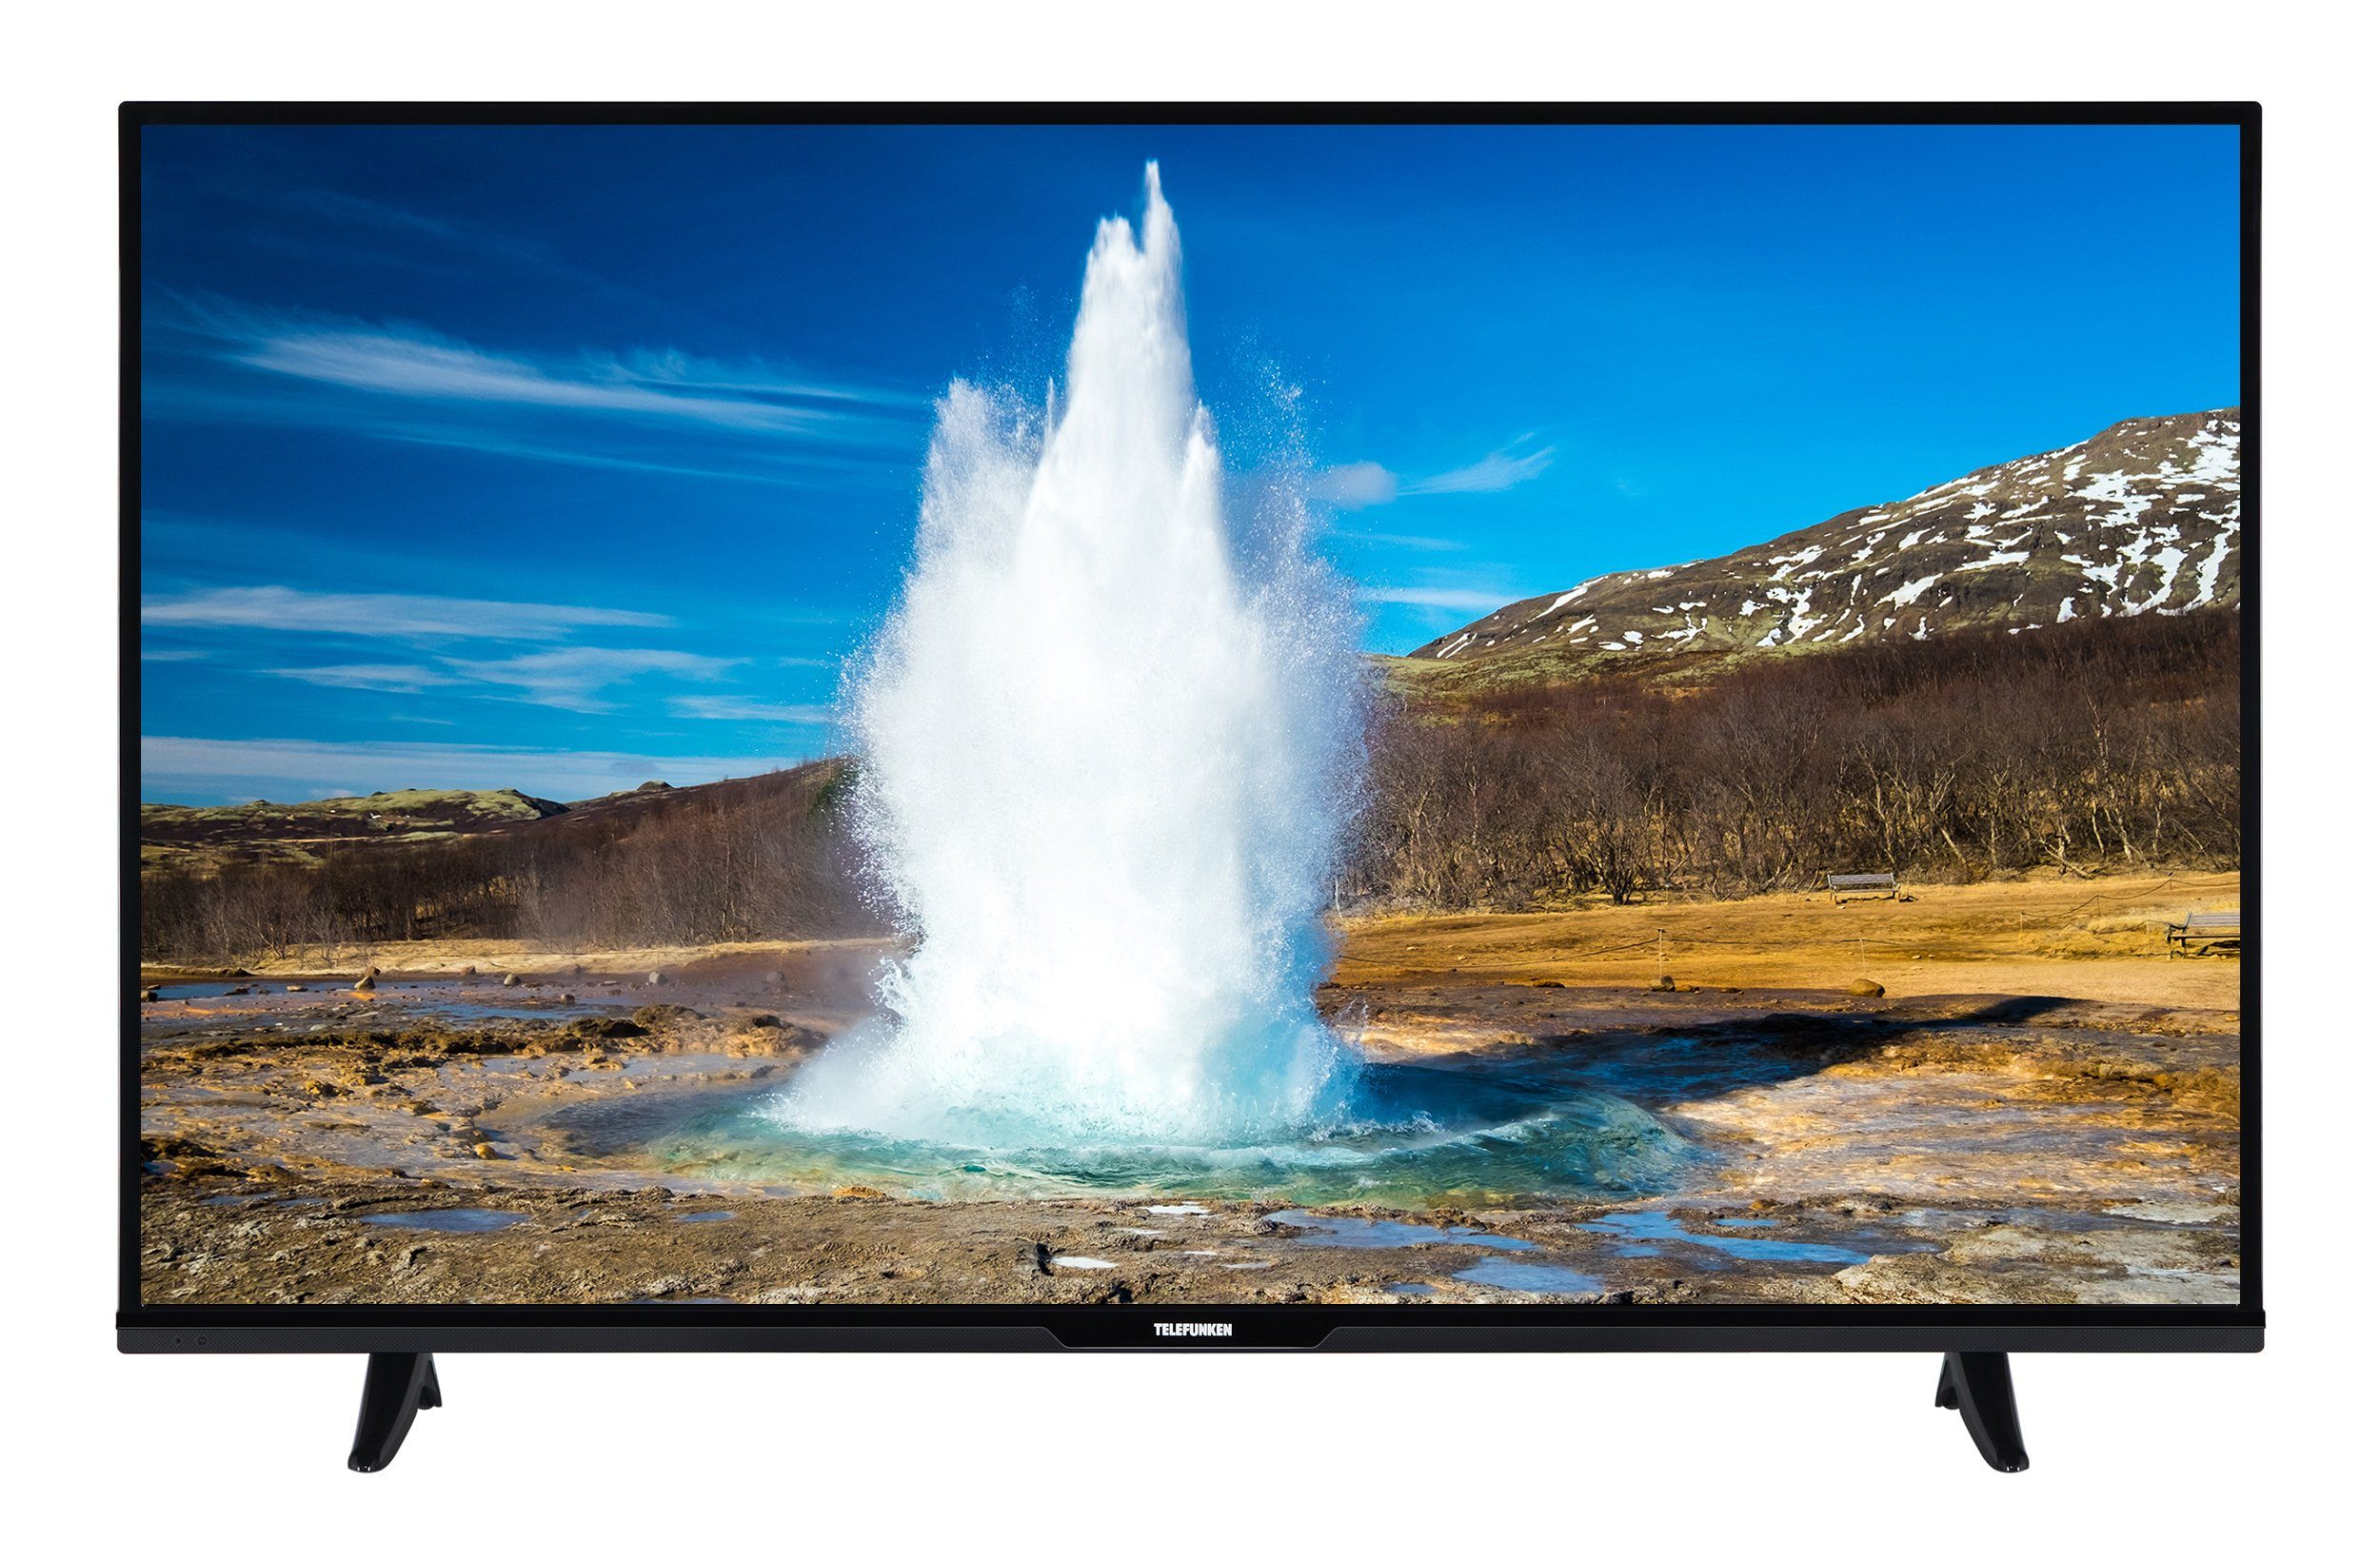 Telefunken LED-Fernseher (55 Zoll, Full HD, SmartTV, DVB-T2 HD) »XF55D401«